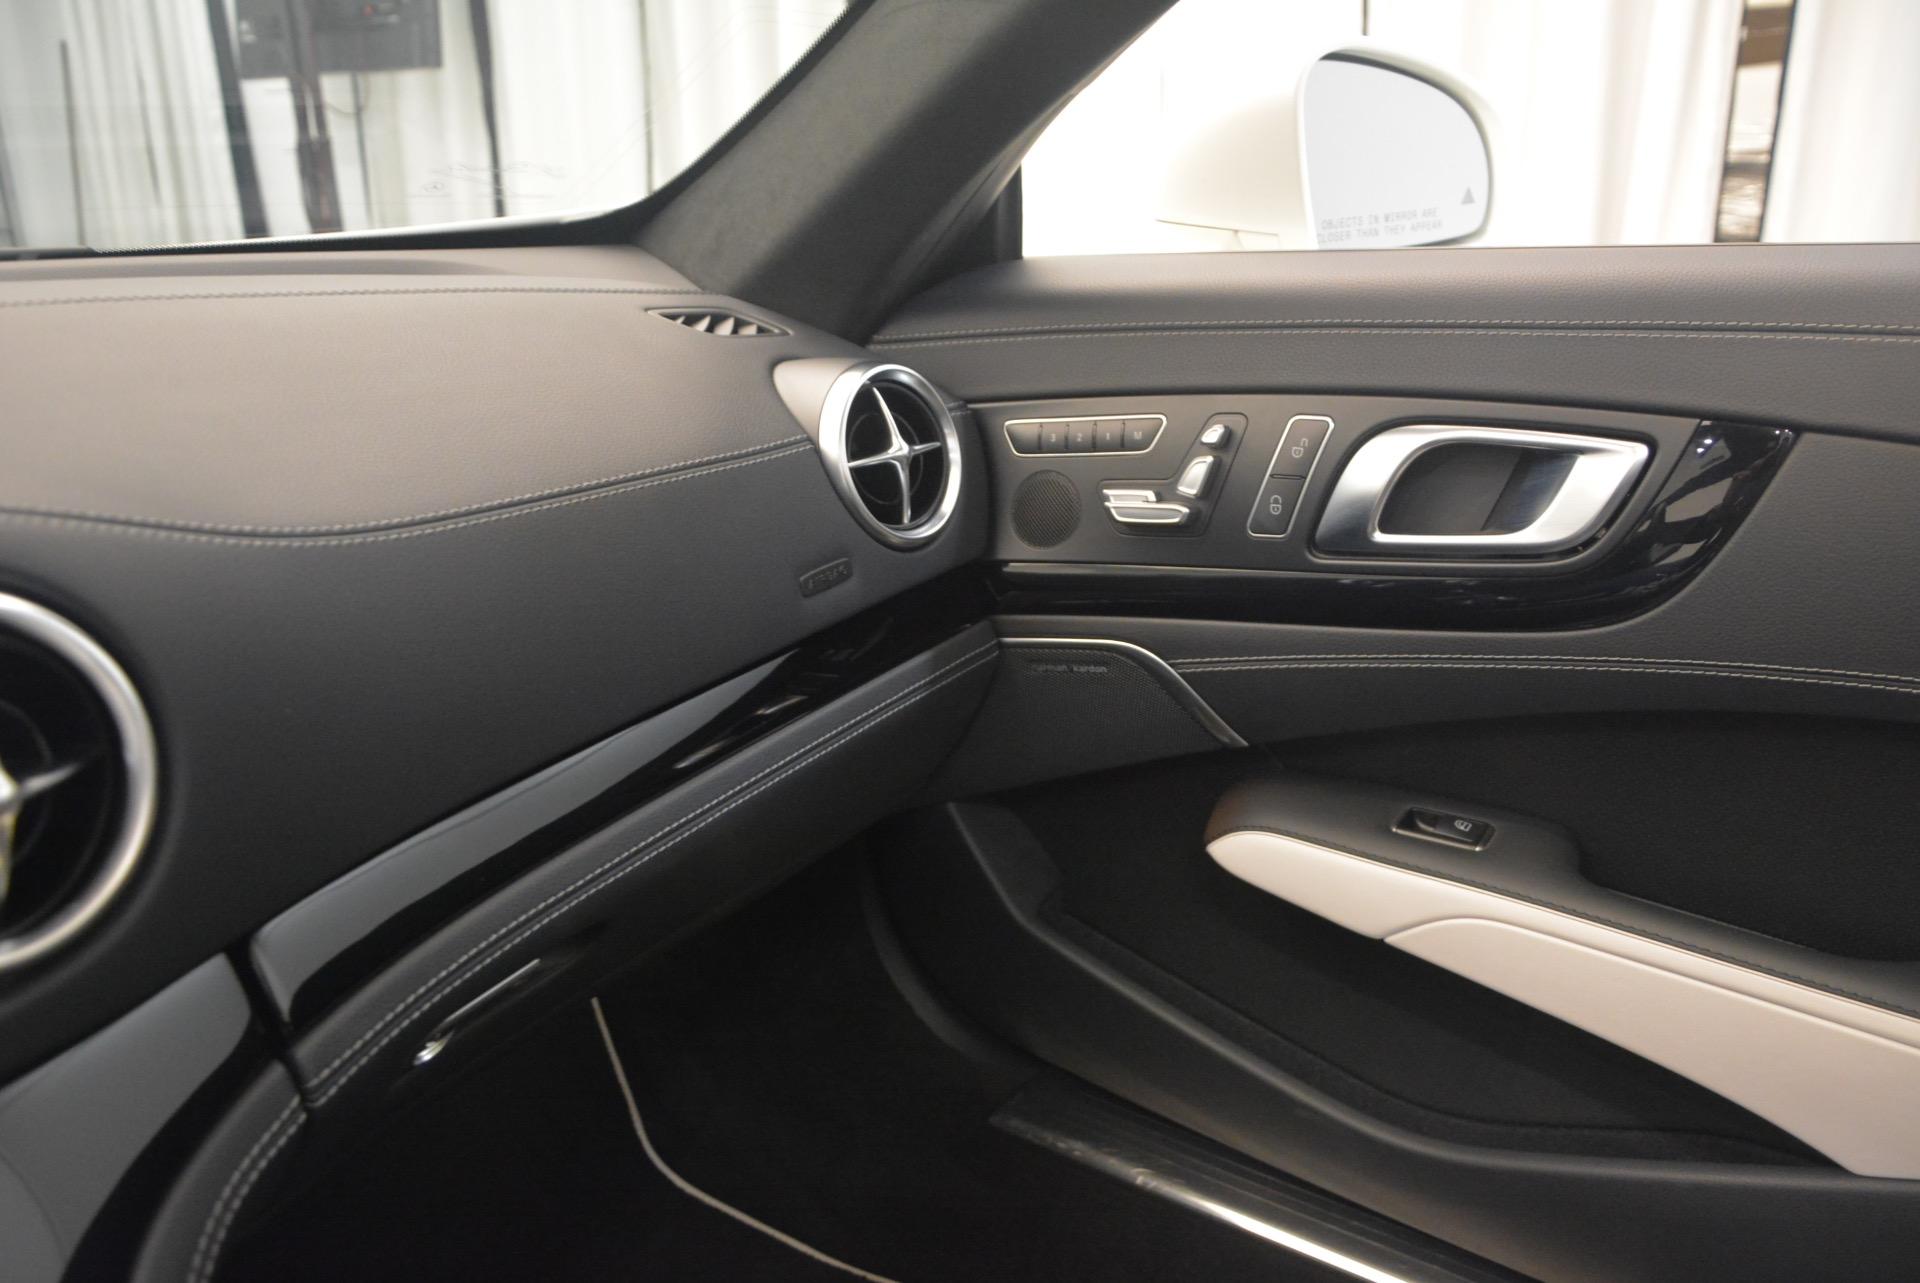 Used 2015 Mercedes Benz SL-Class SL 550 For Sale In Greenwich, CT. Alfa Romeo of Greenwich, M1874A 1261_p36